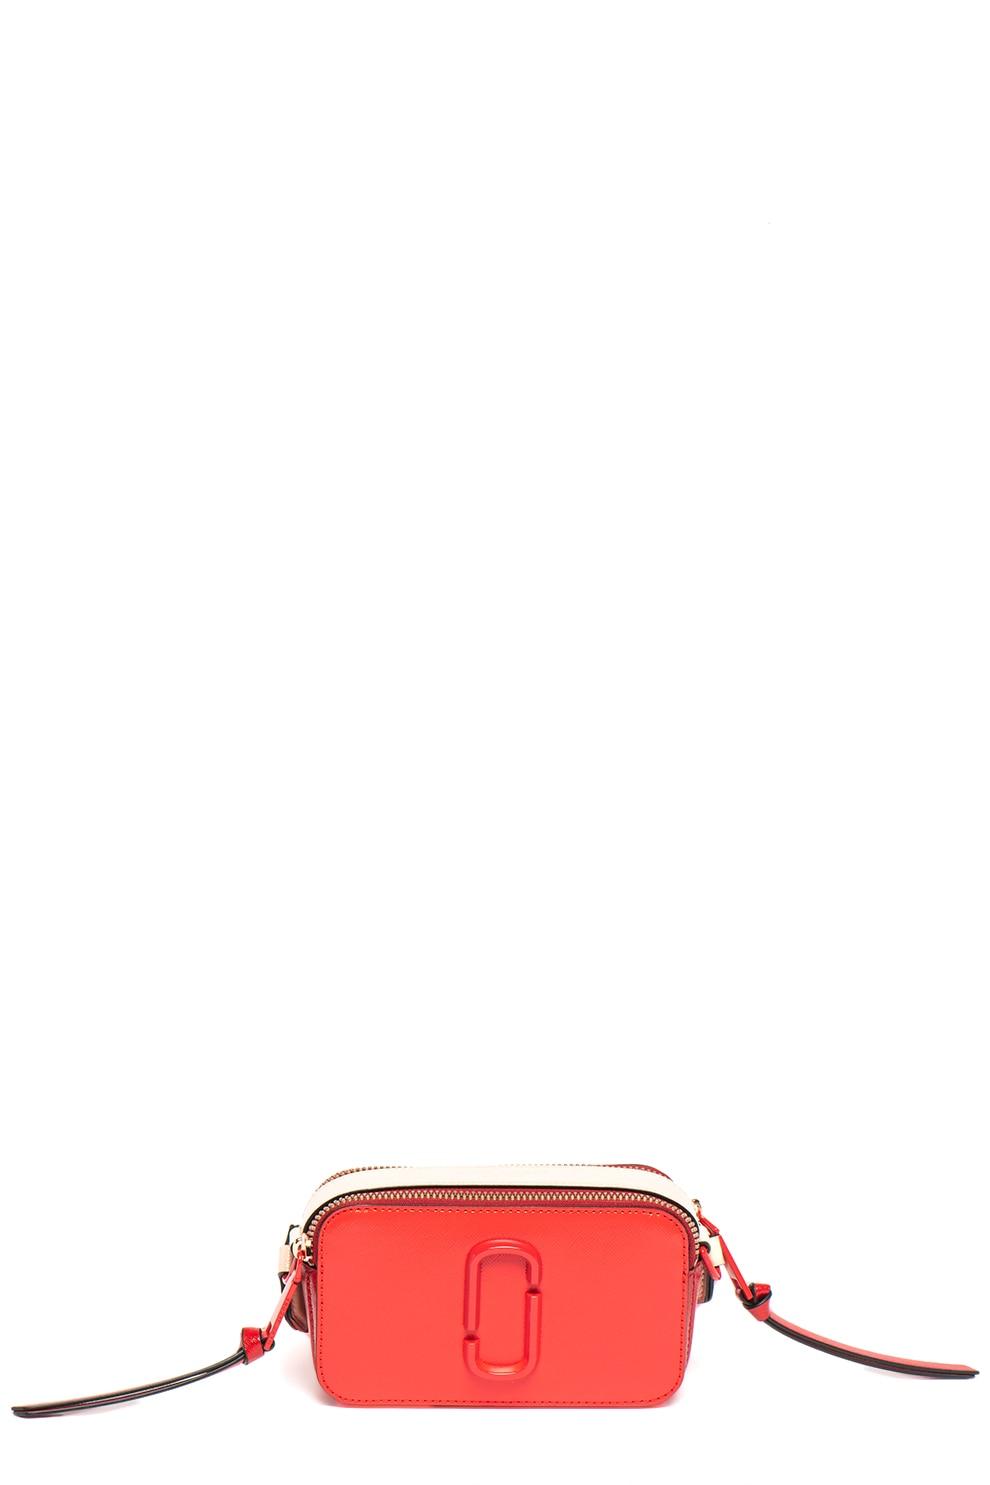 Fotografie Marc Jacobs, Geanta crossbody de piele peliculizata, cu monograma metalica, Rosu vermilion.Rosu inchis/Roz piersica